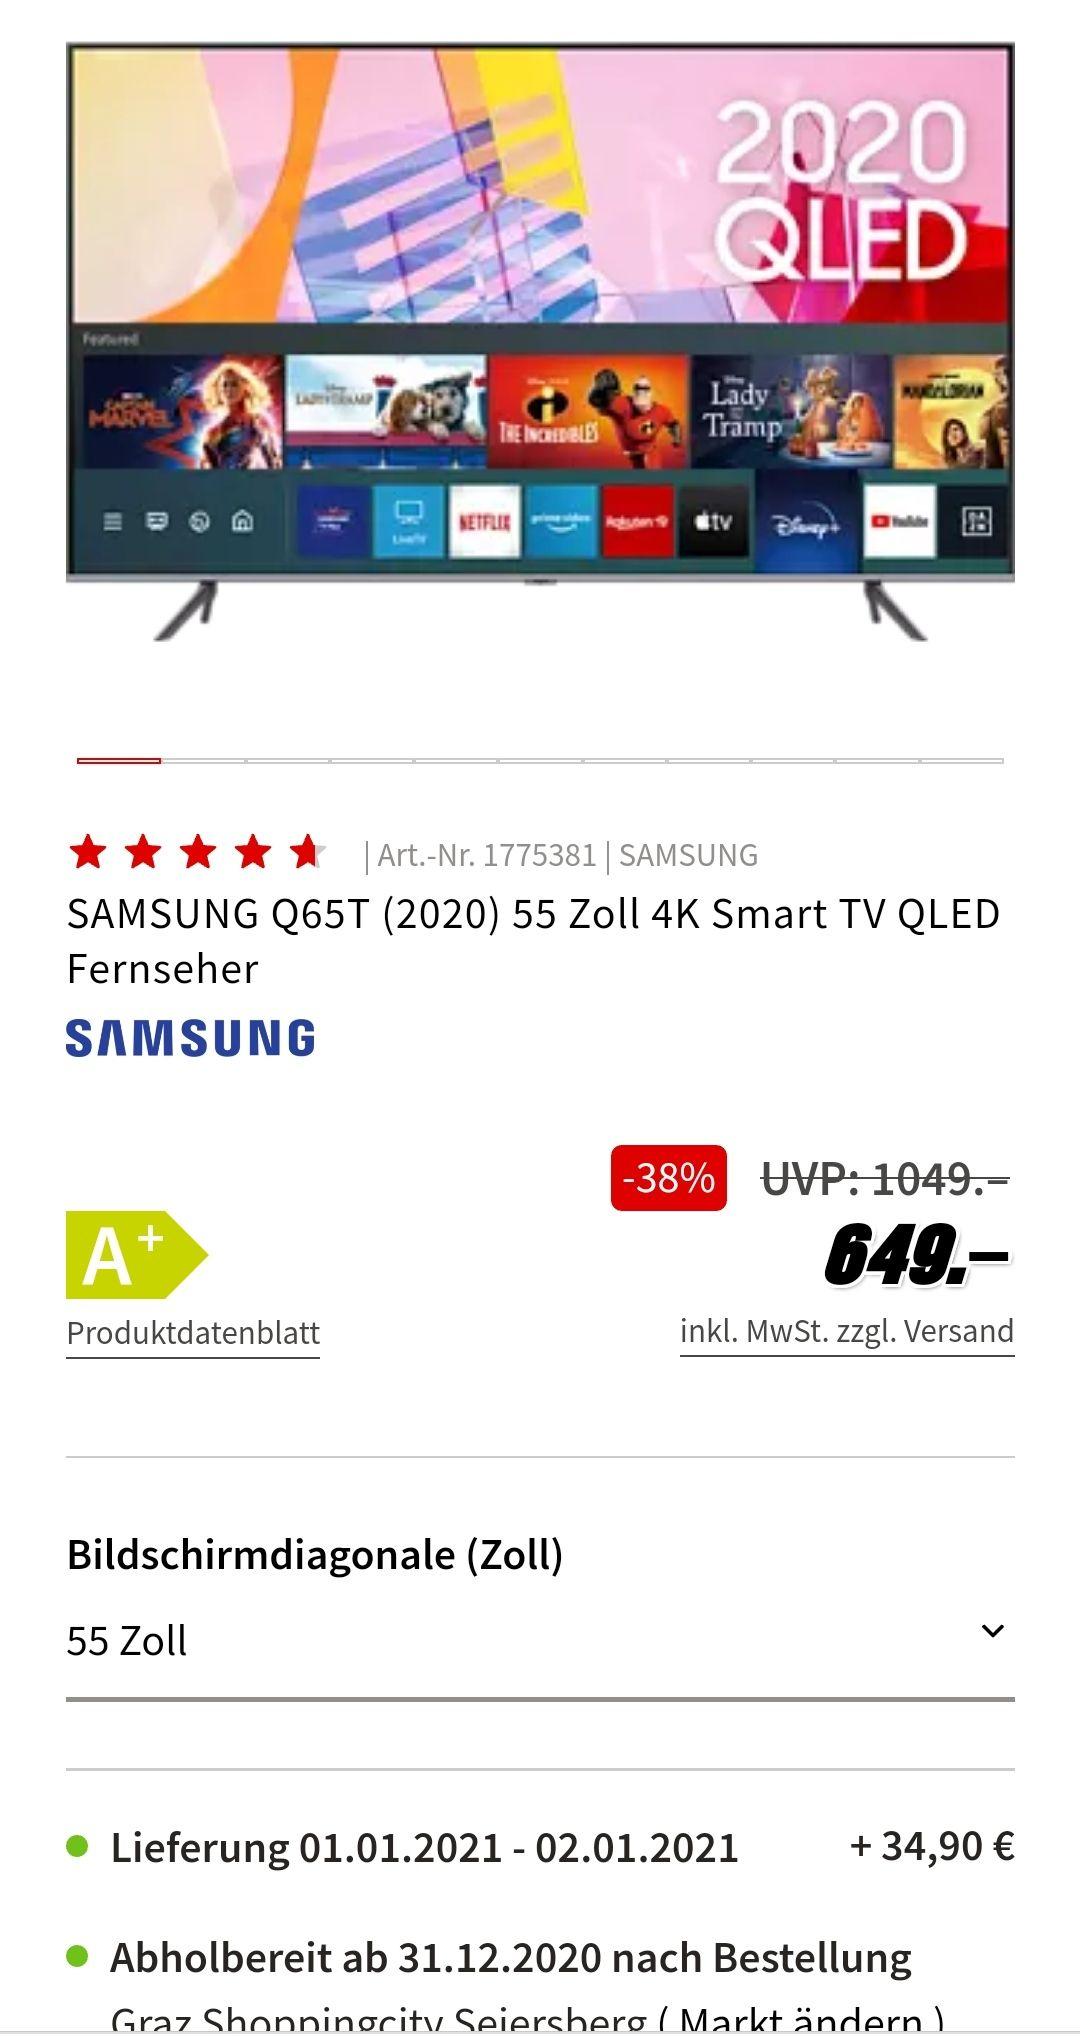 SAMSUNG Q65T (2020) 55 Zoll 4K Smart TV QLED Fernseher